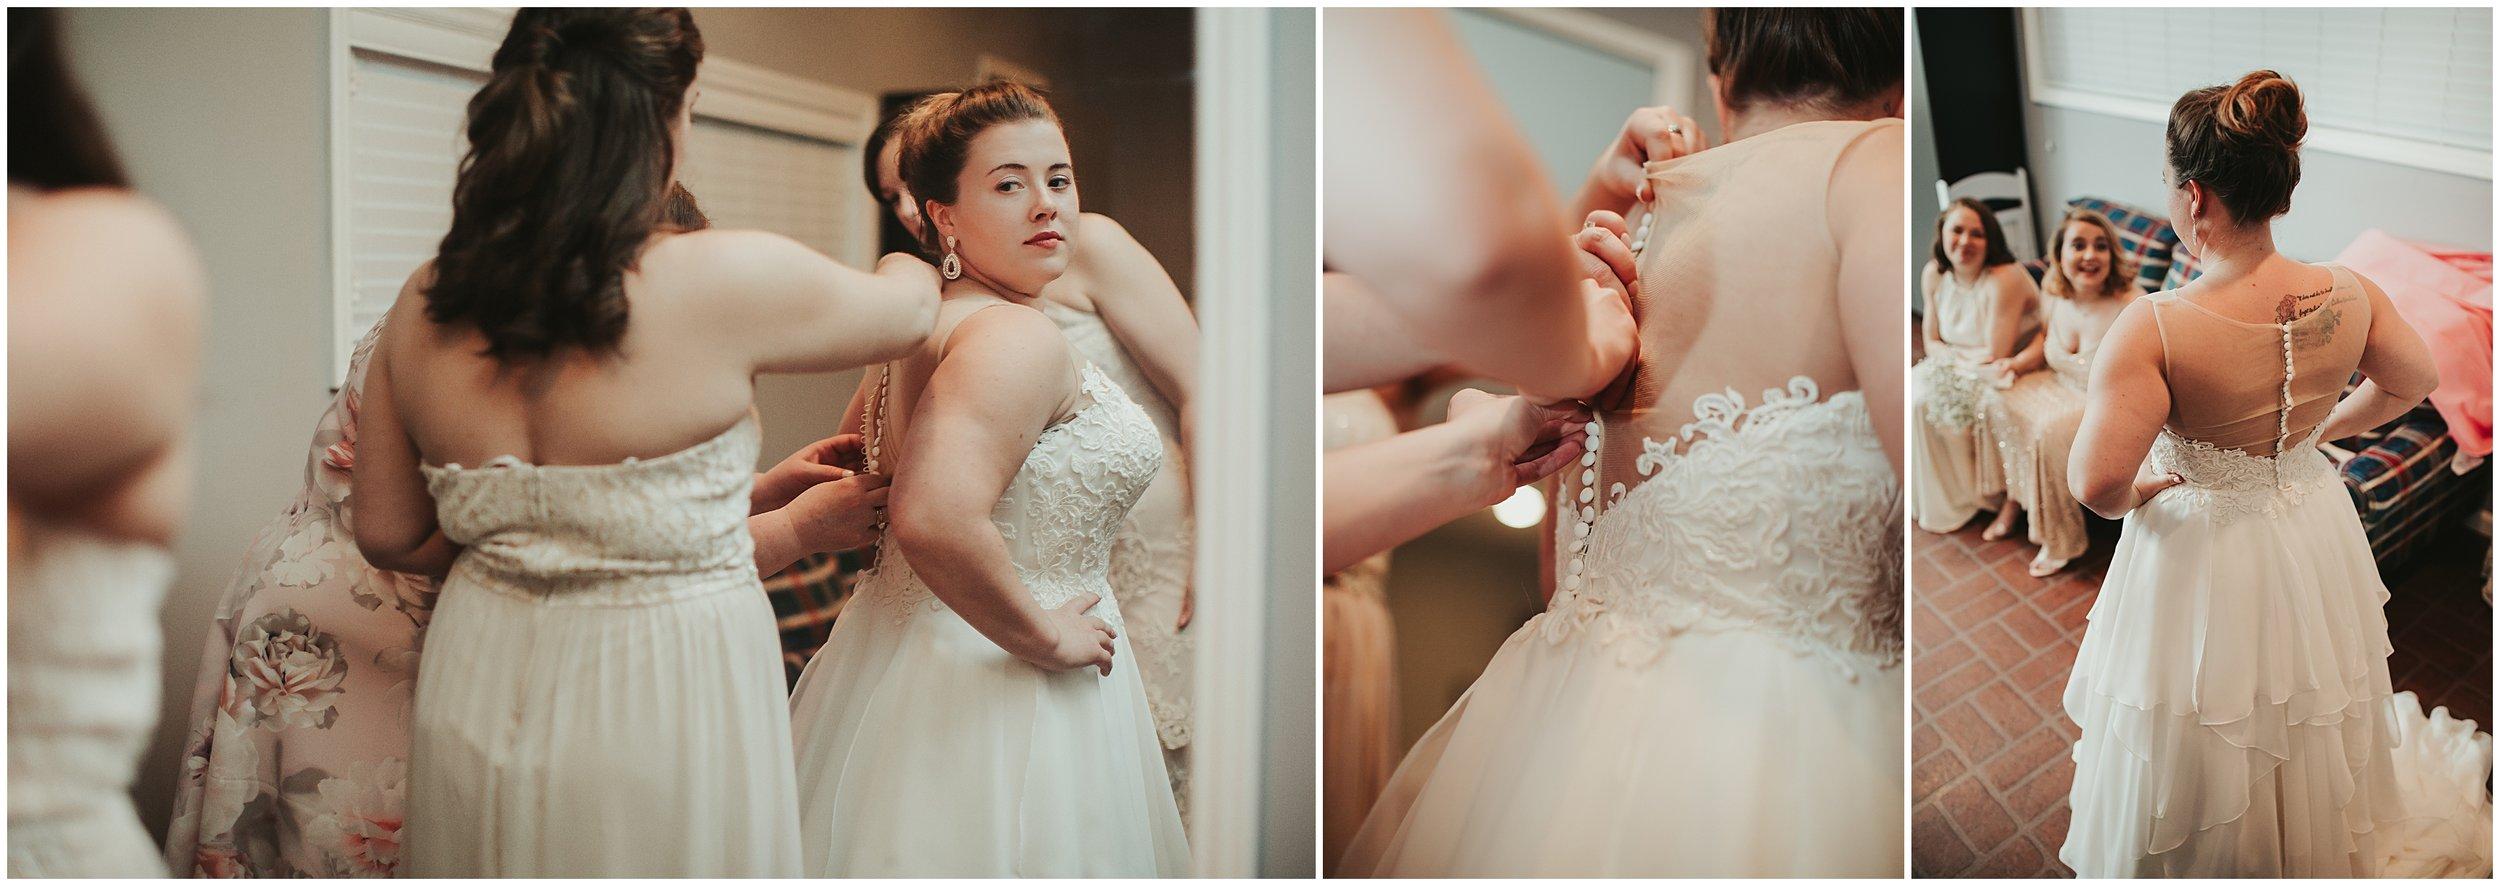 Charlotte NC wedding photographer_0724.jpg